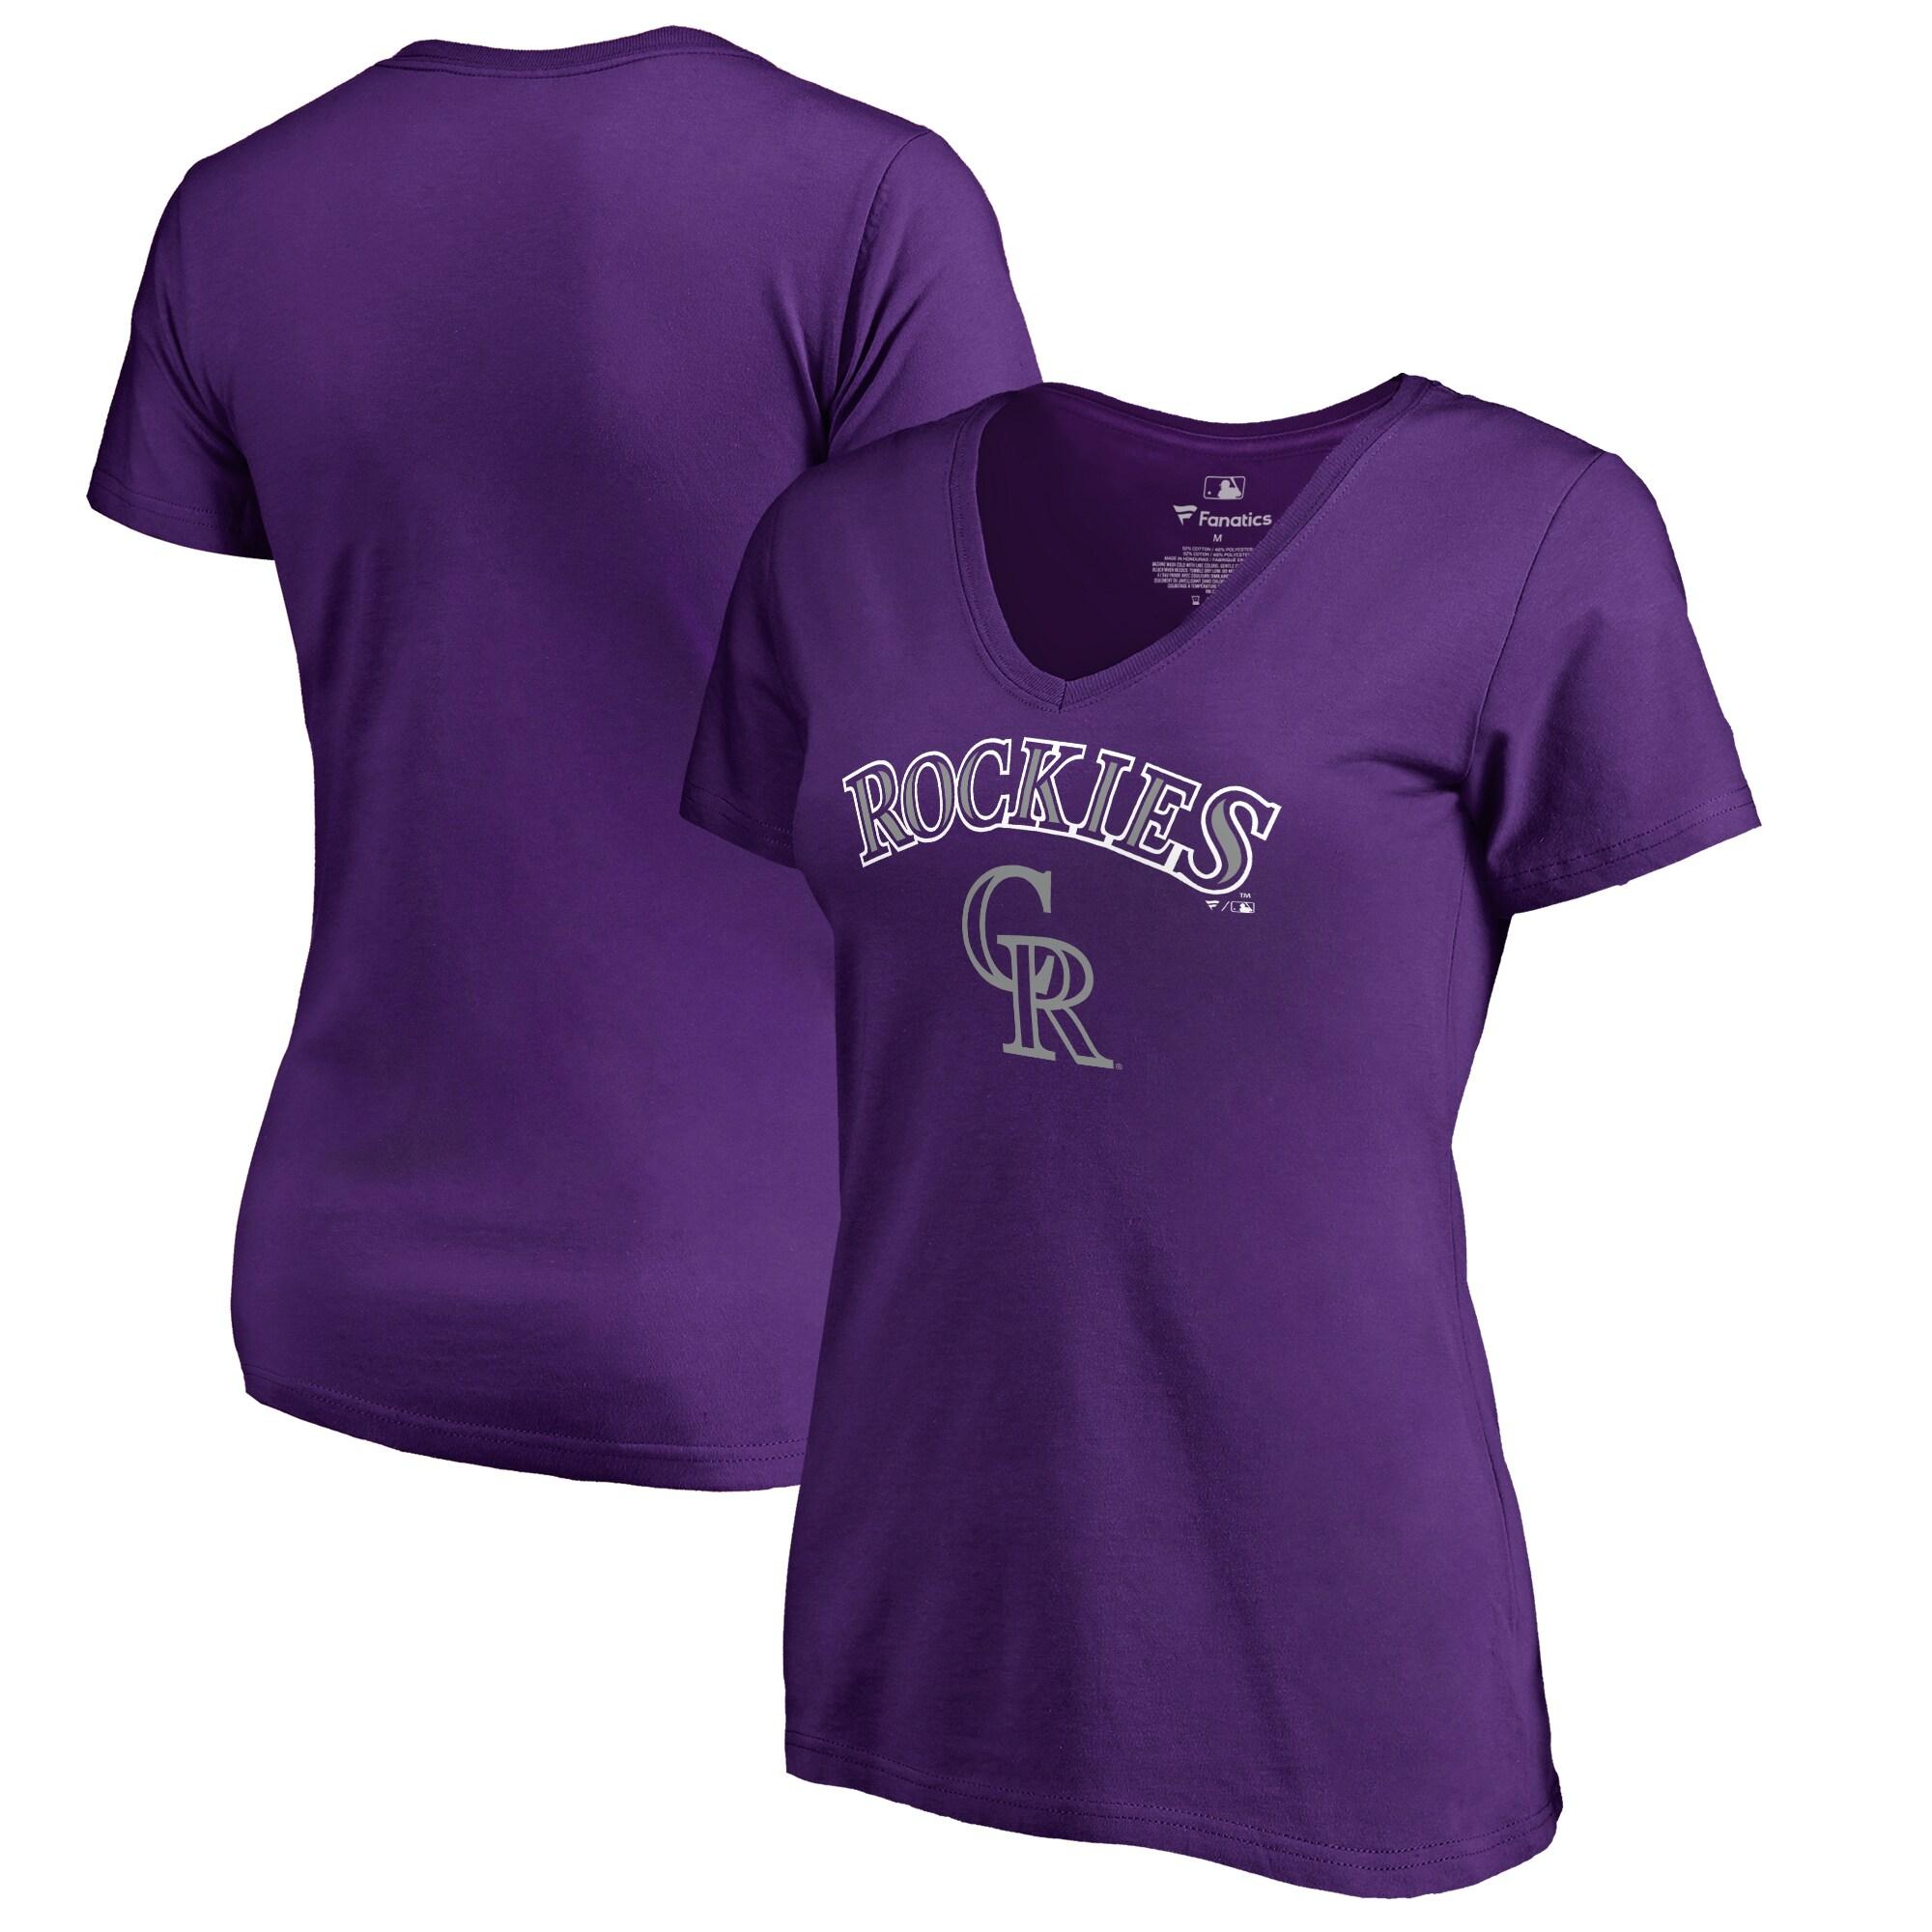 Colorado Rockies Fanatics Branded Women's Plus Sizes Team Lockup T-Shirt - Purple